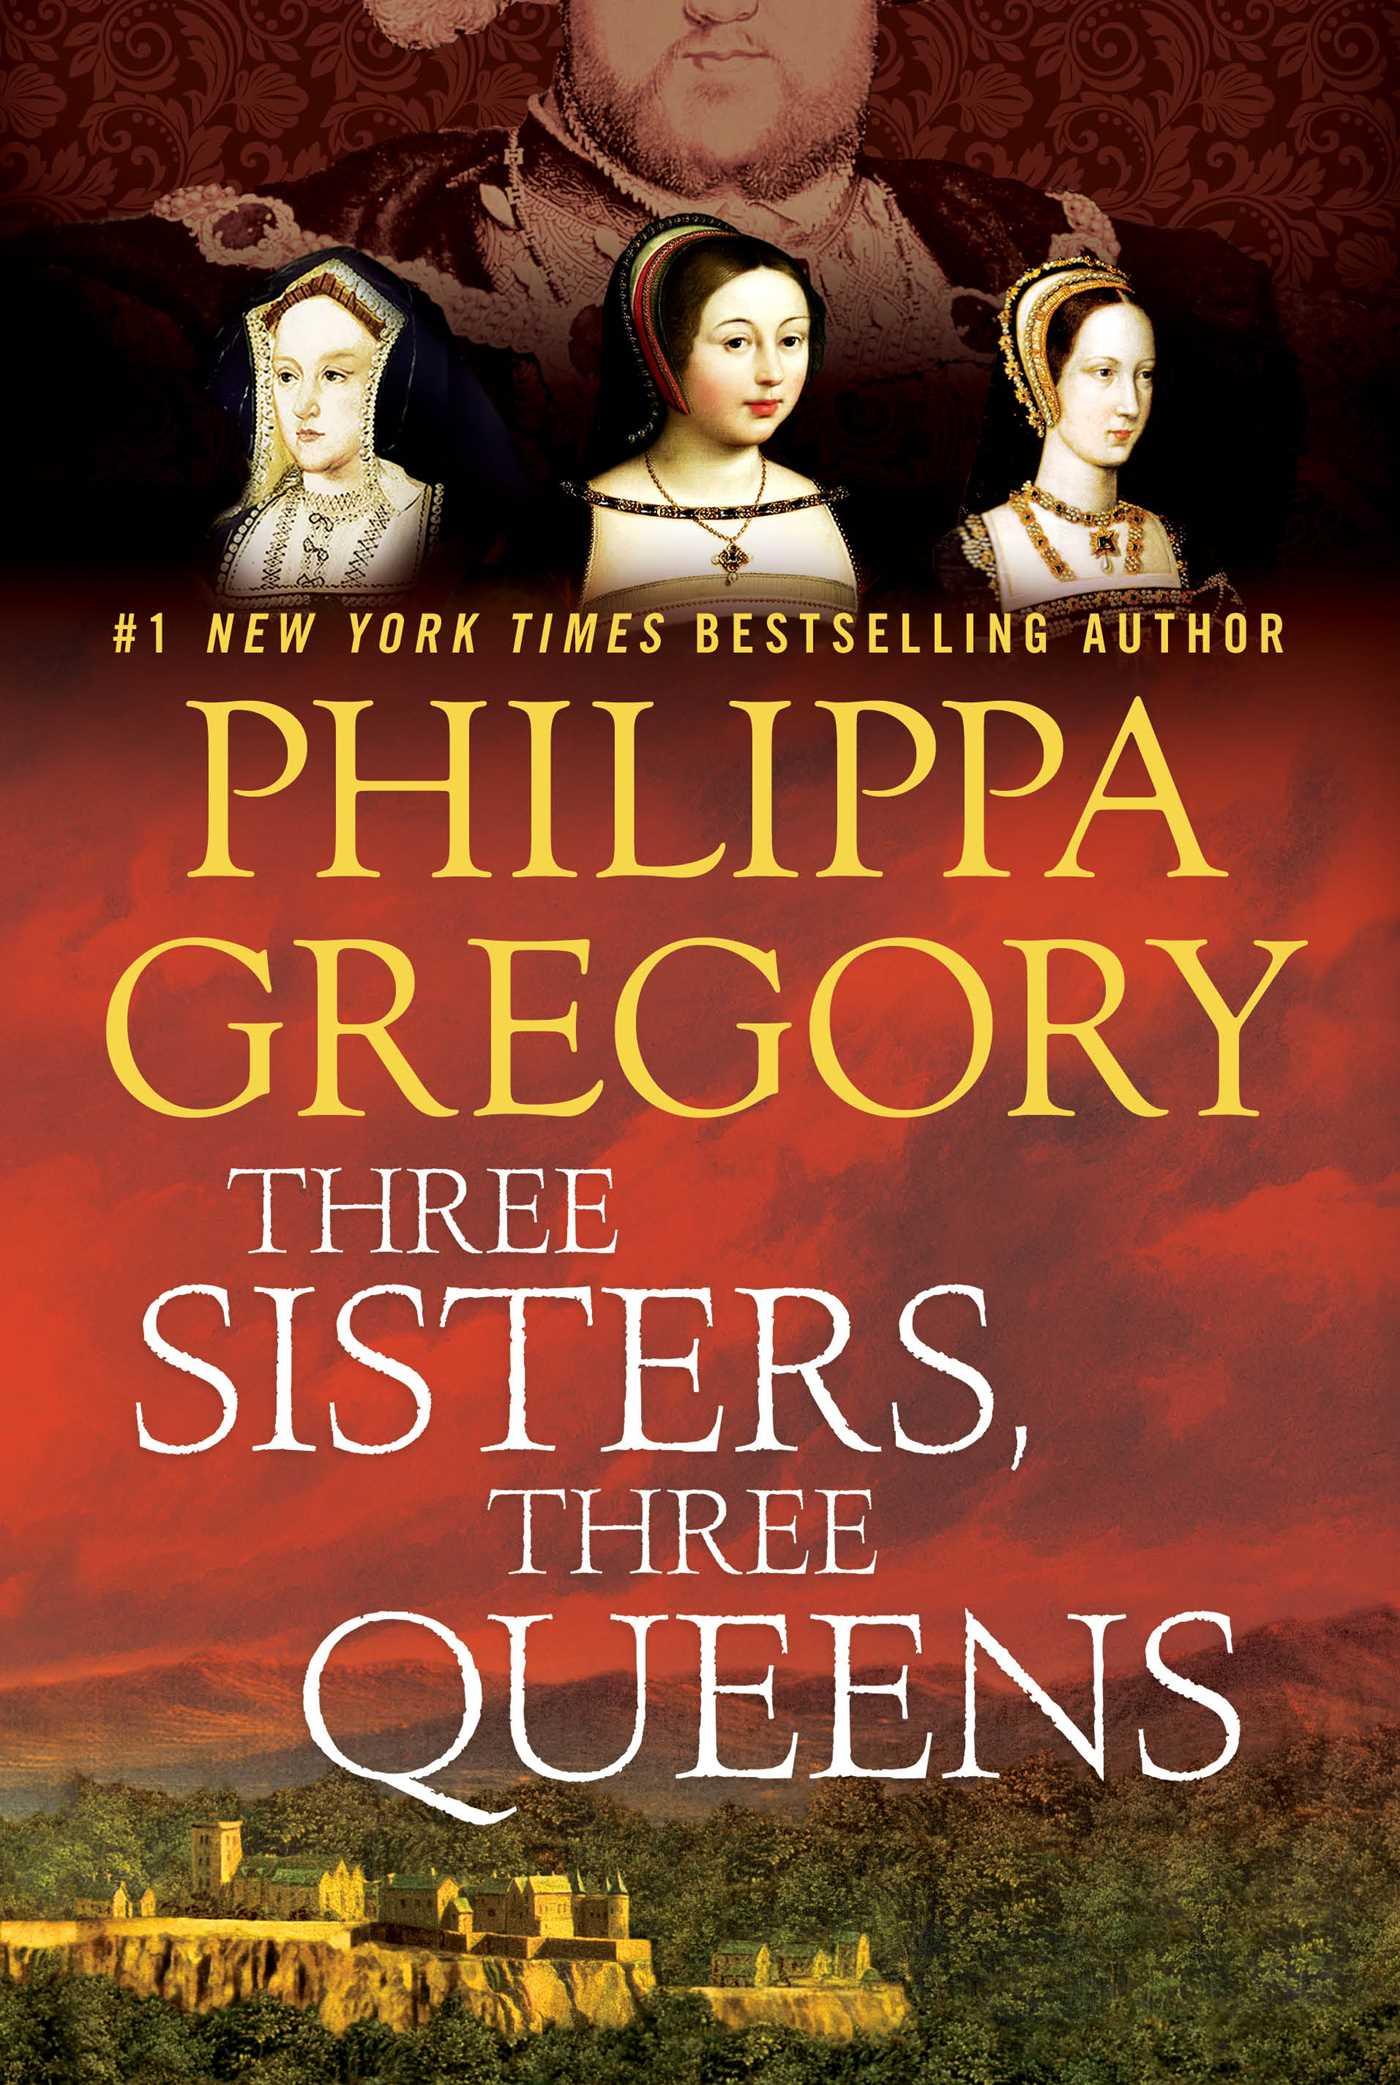 Three sisters three queens 9781476758572 hr